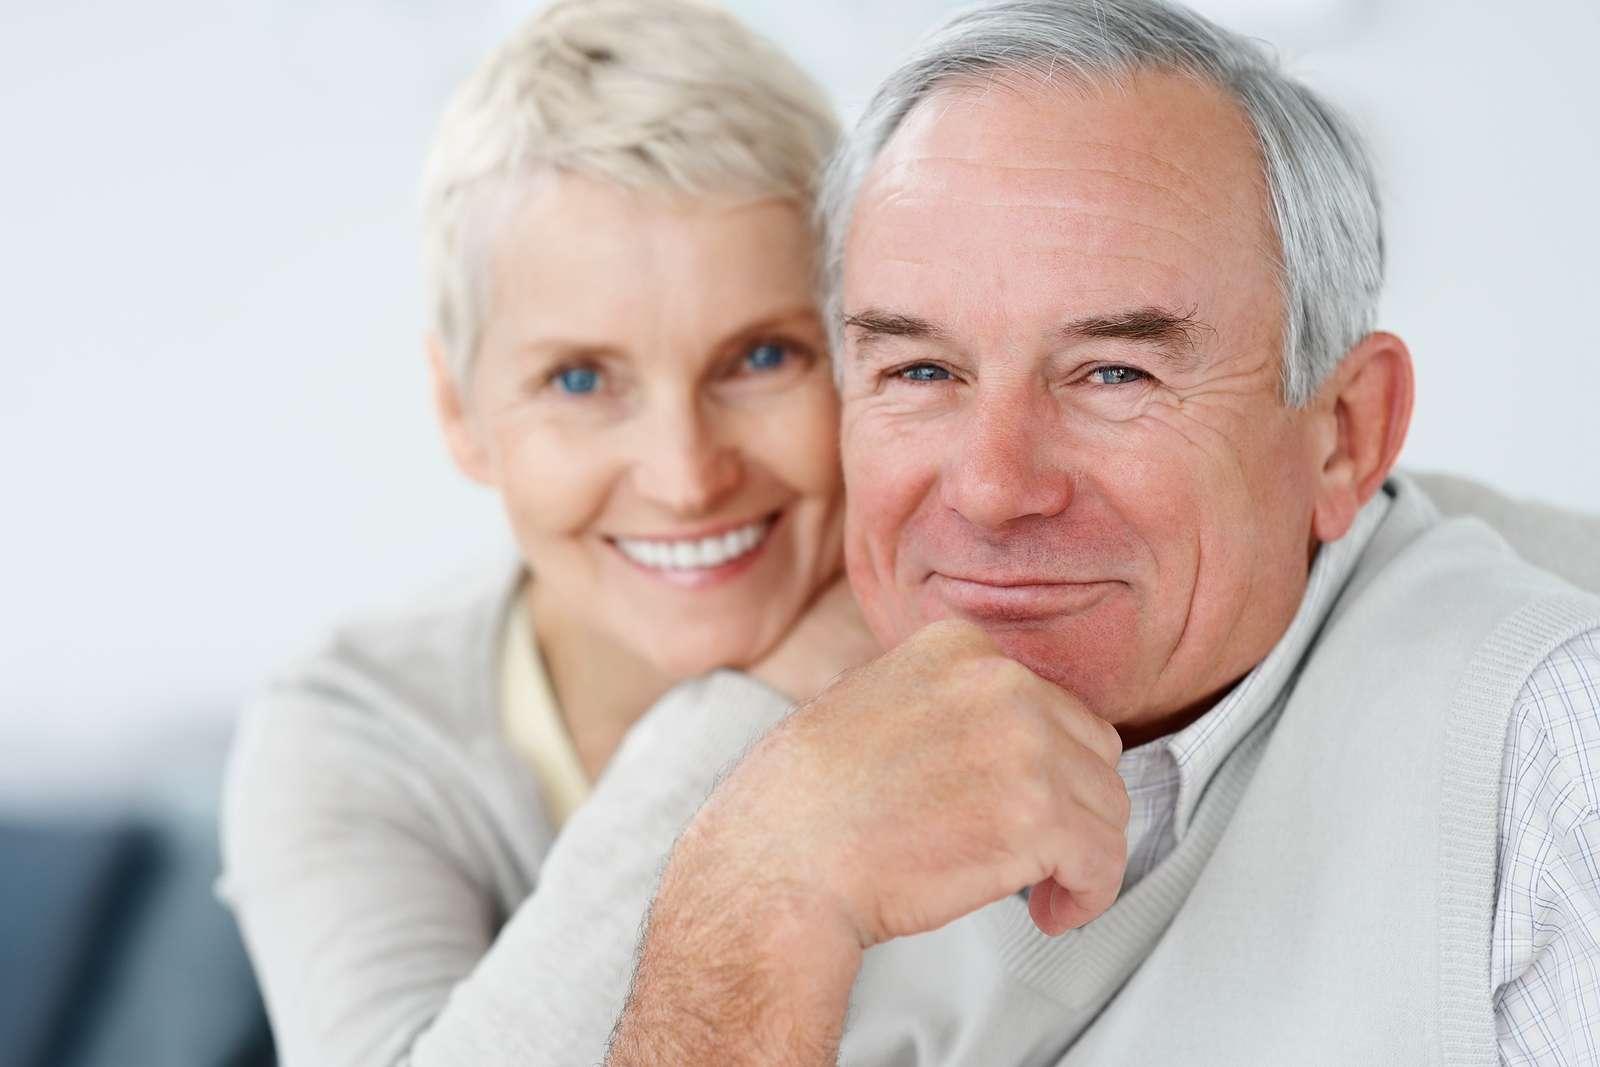 Should elderly people live alone?